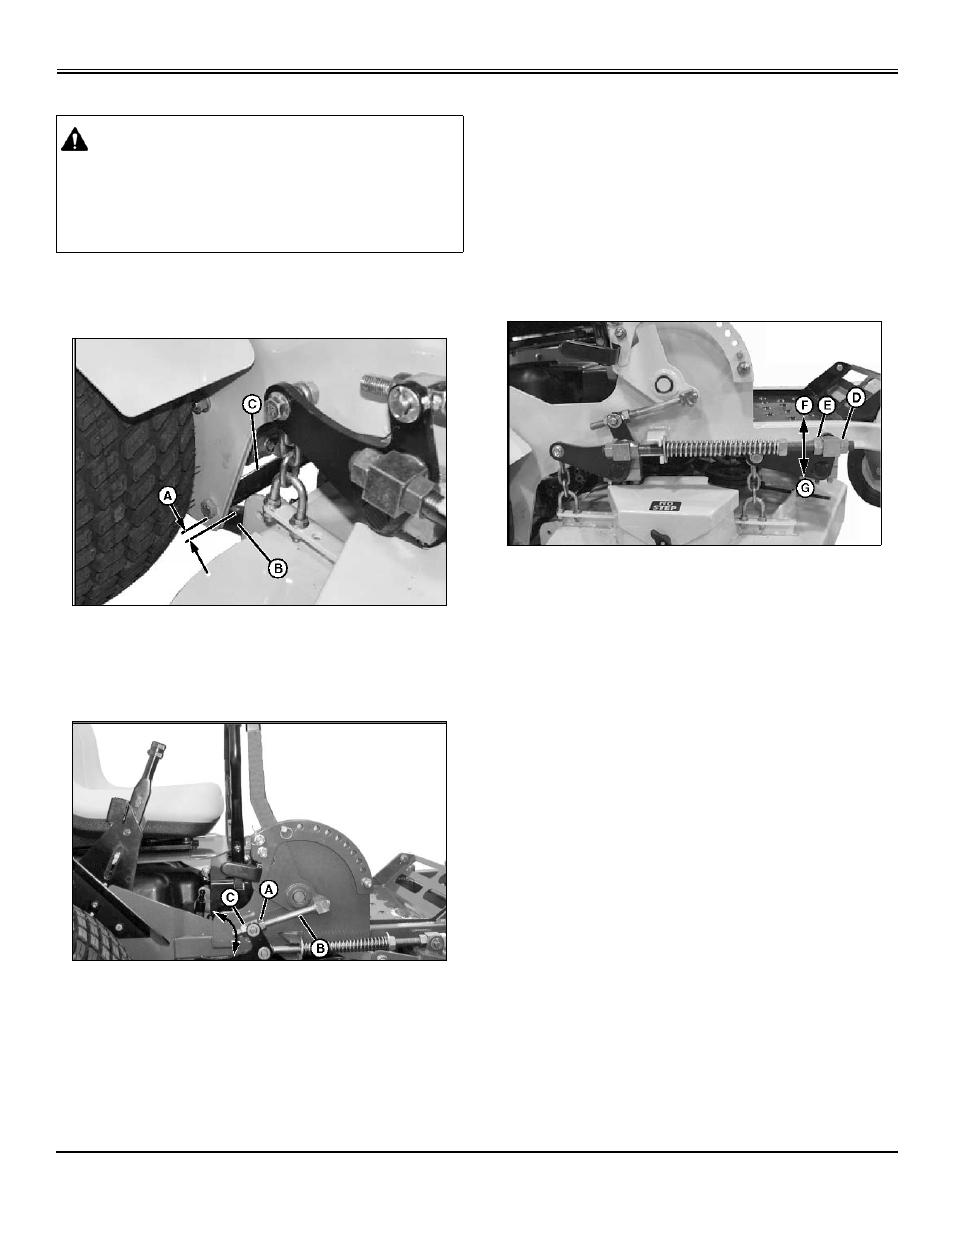 Great Dane Mower Wiring Diagram Electrical Diagrams Walker Chariot Jr Parts Manual Enthusiast U2022